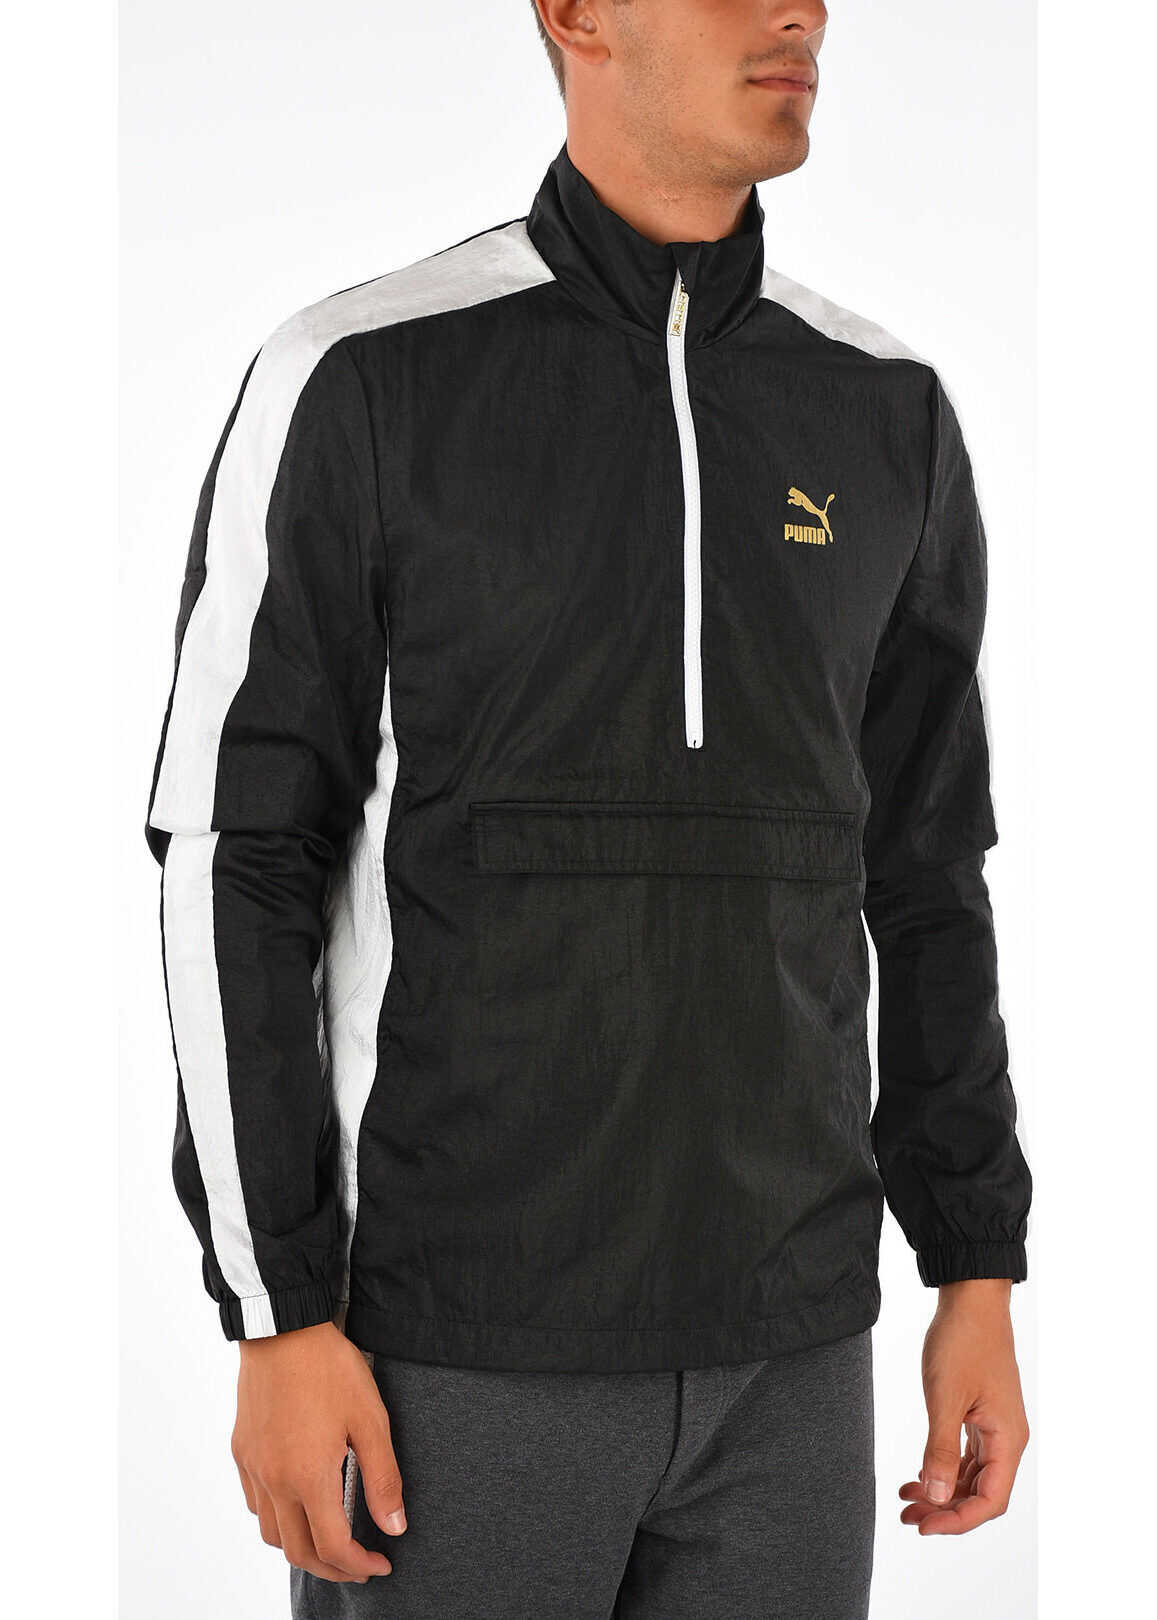 PUMA Nylon Jacket BLACK